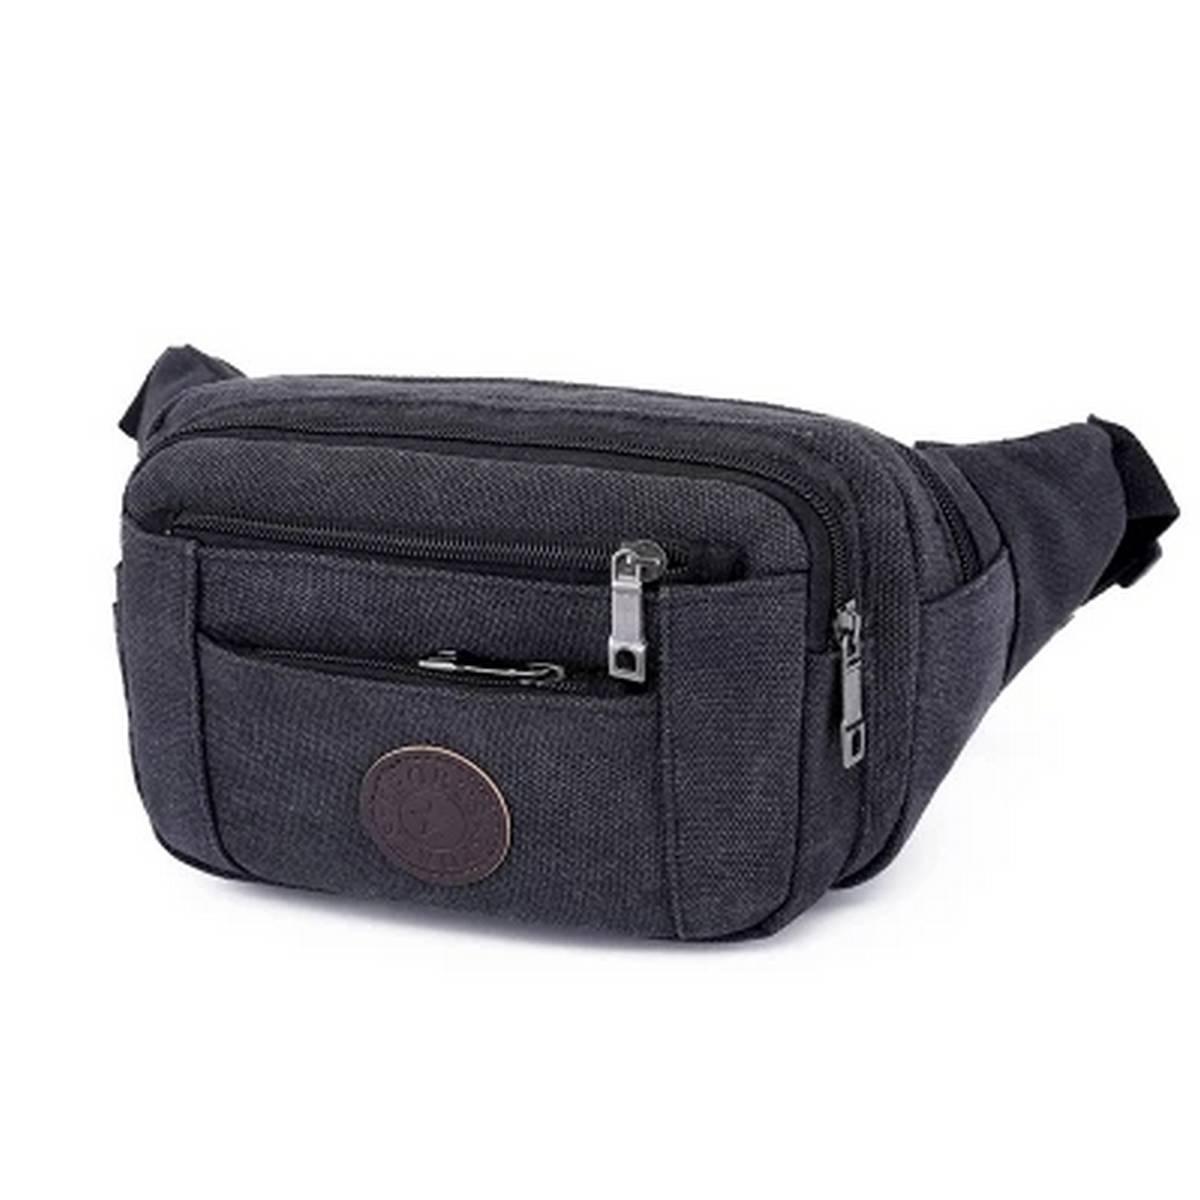 New Men Small Waist bag  Multiple pocket Canvas mobile&change Carrier